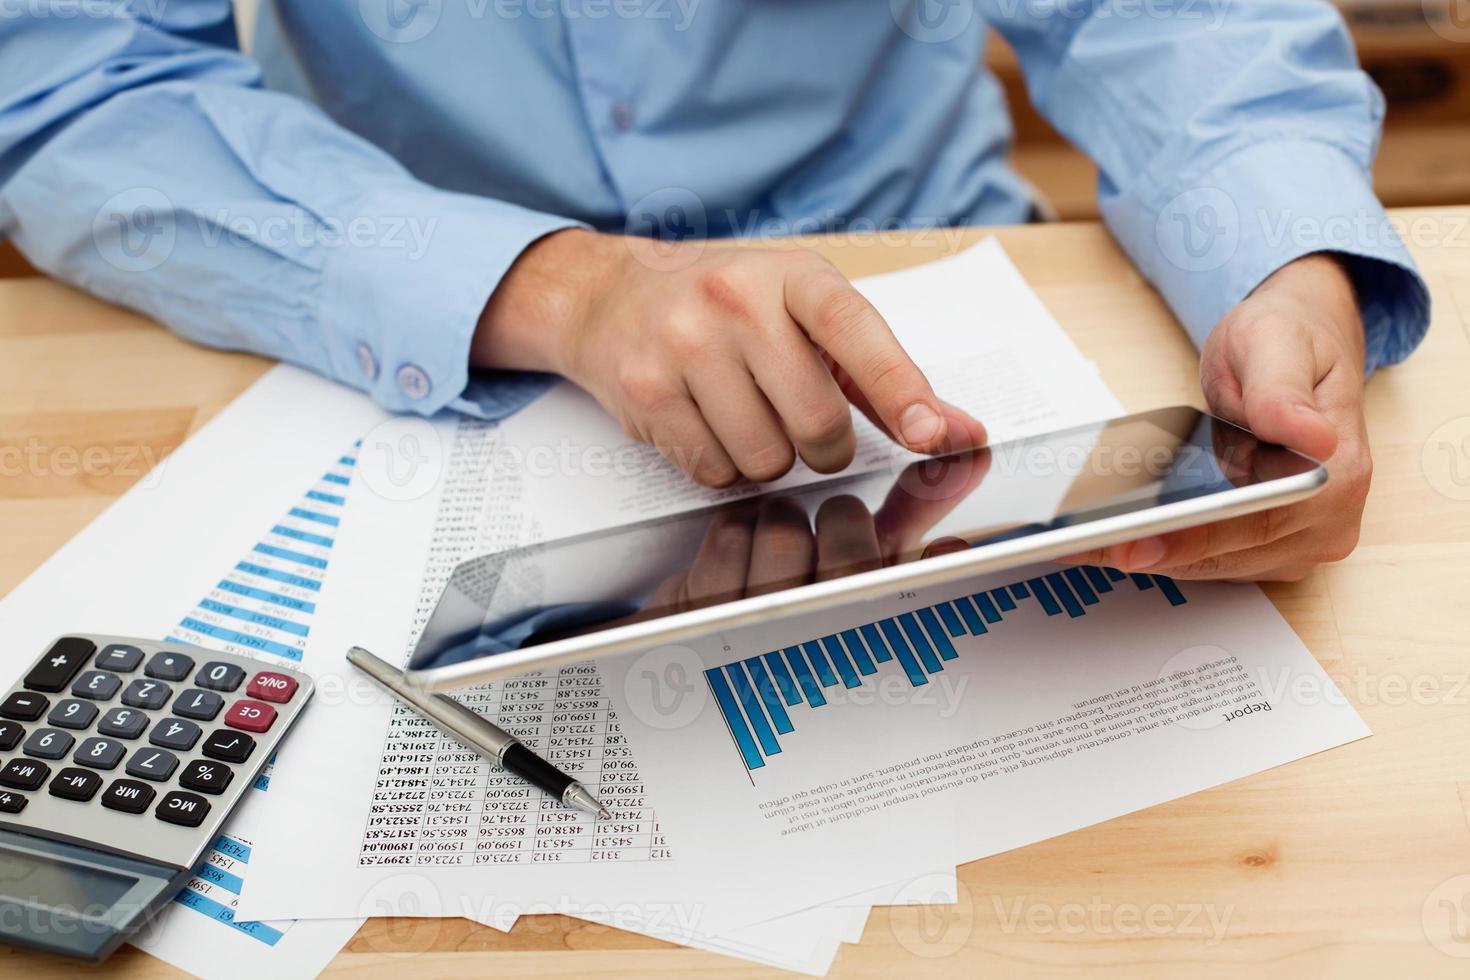 Investition mit digitalem Tablet foto